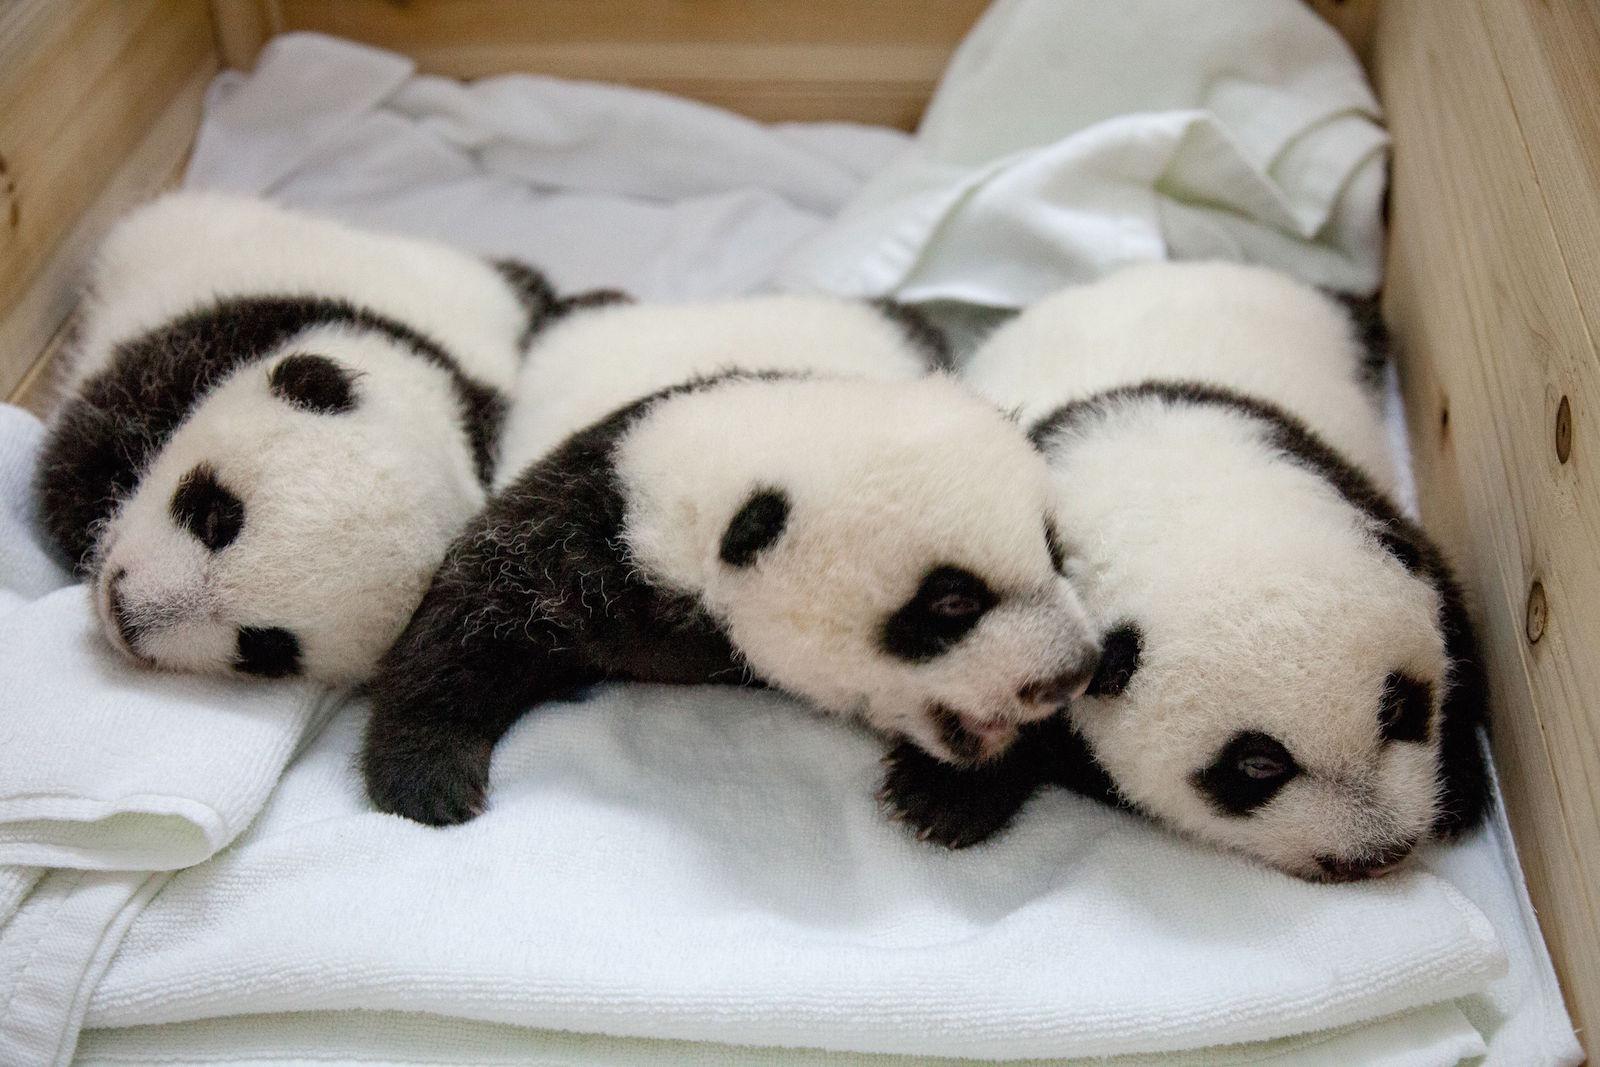 CHINA-ANIMAL-PANDA-ZOO-SCIENCE